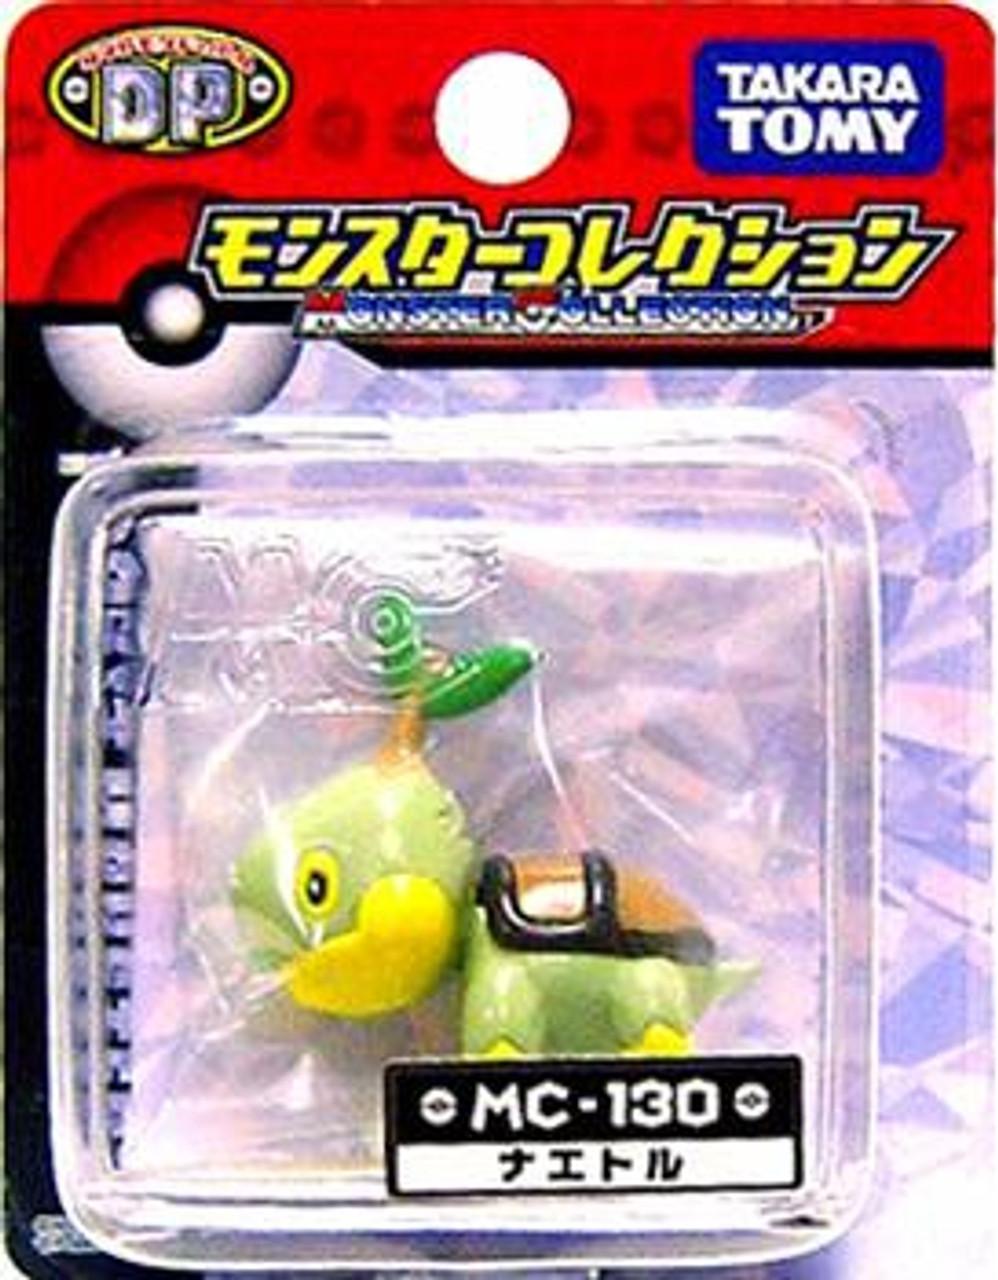 Pokemon Diamond & Pearl Monster Collection Turtwig PVC Figure MC-130 [Japanese]